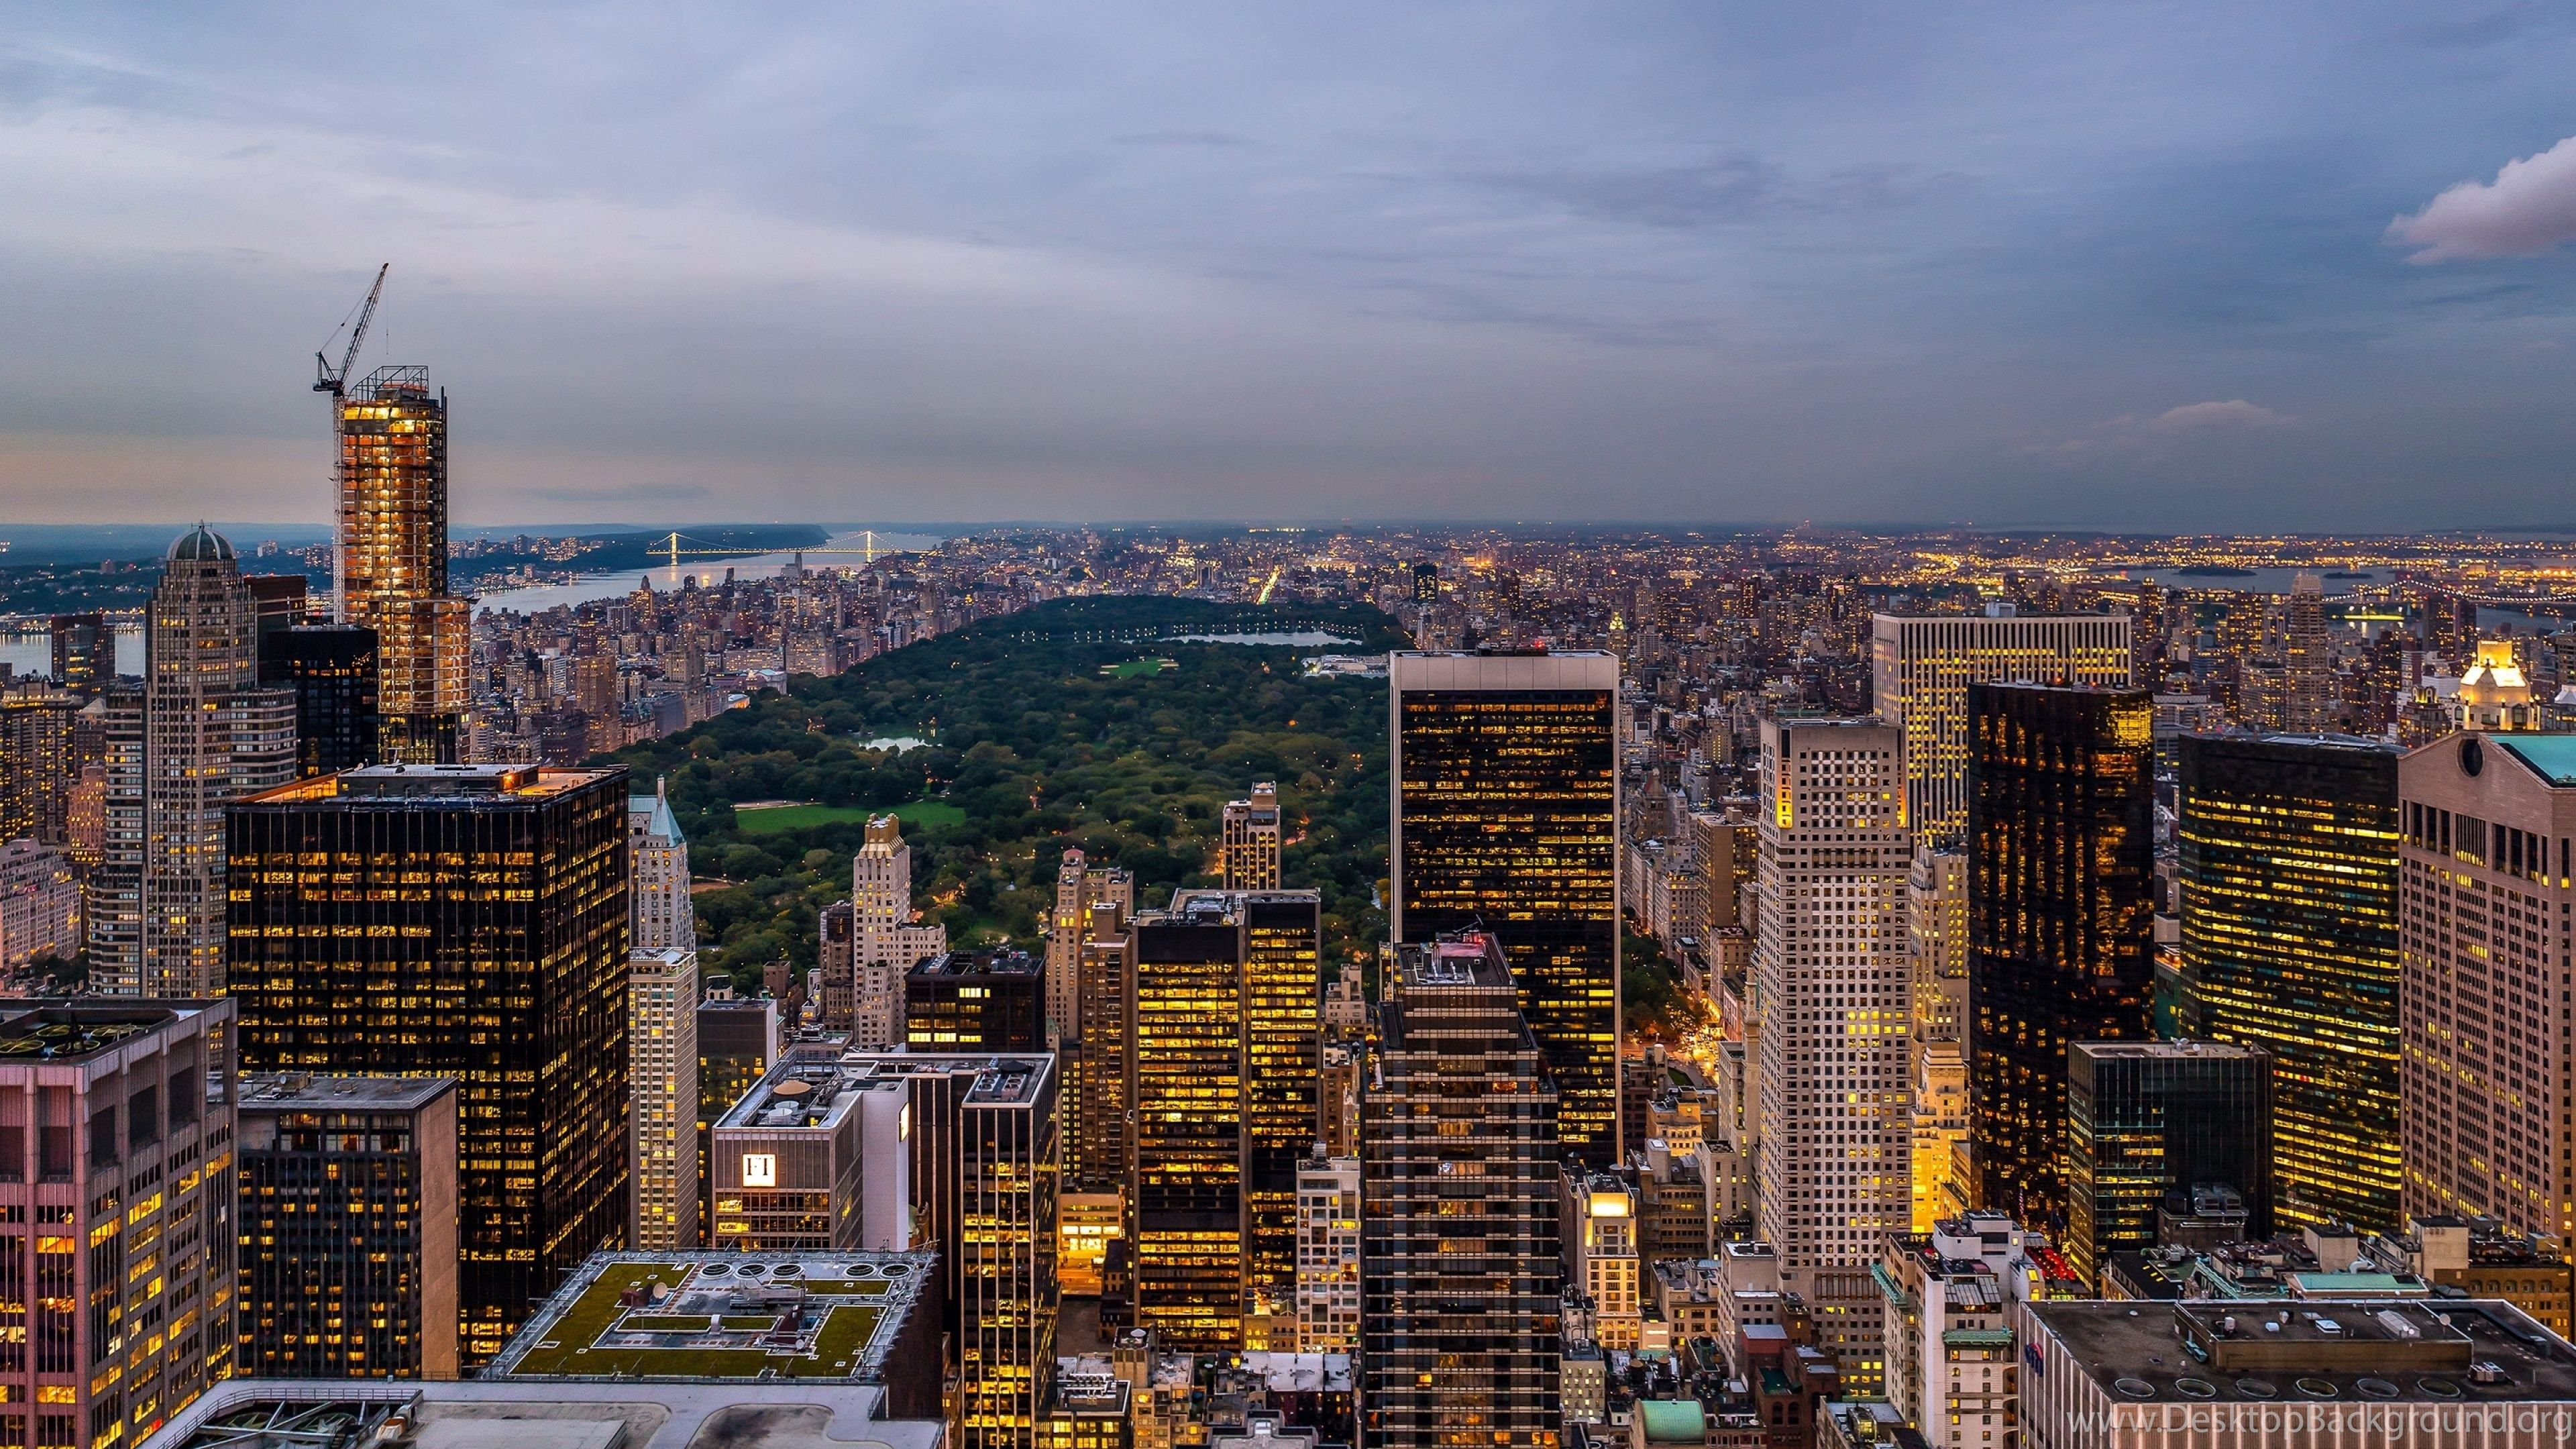 New York City 4K Wallpapers - Wallpaper Cave